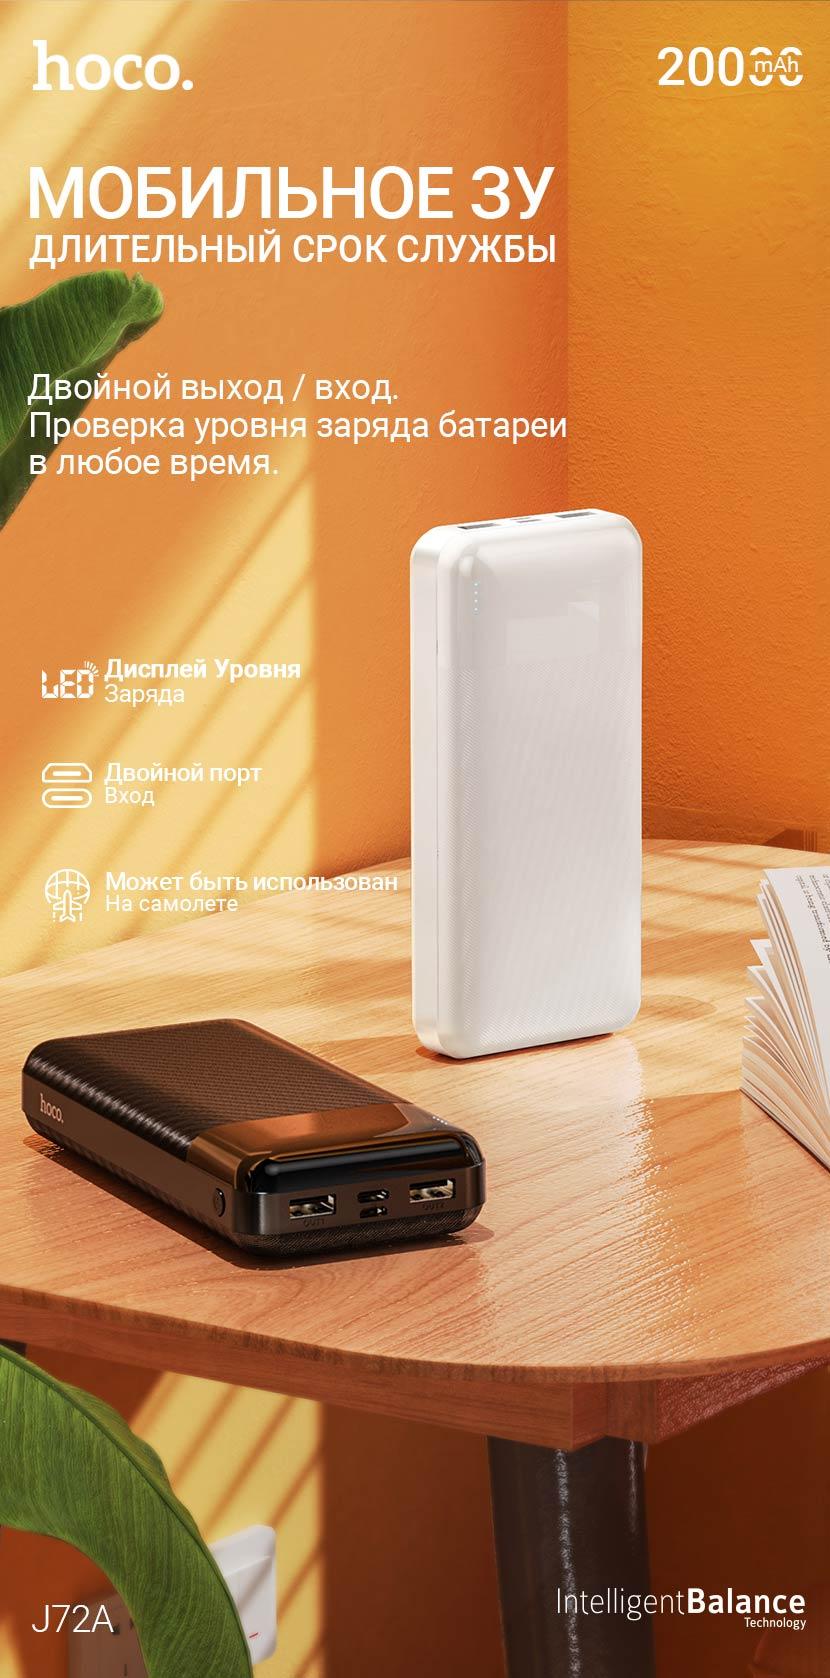 hoco news j72a easy travel power bank 20000mah ru